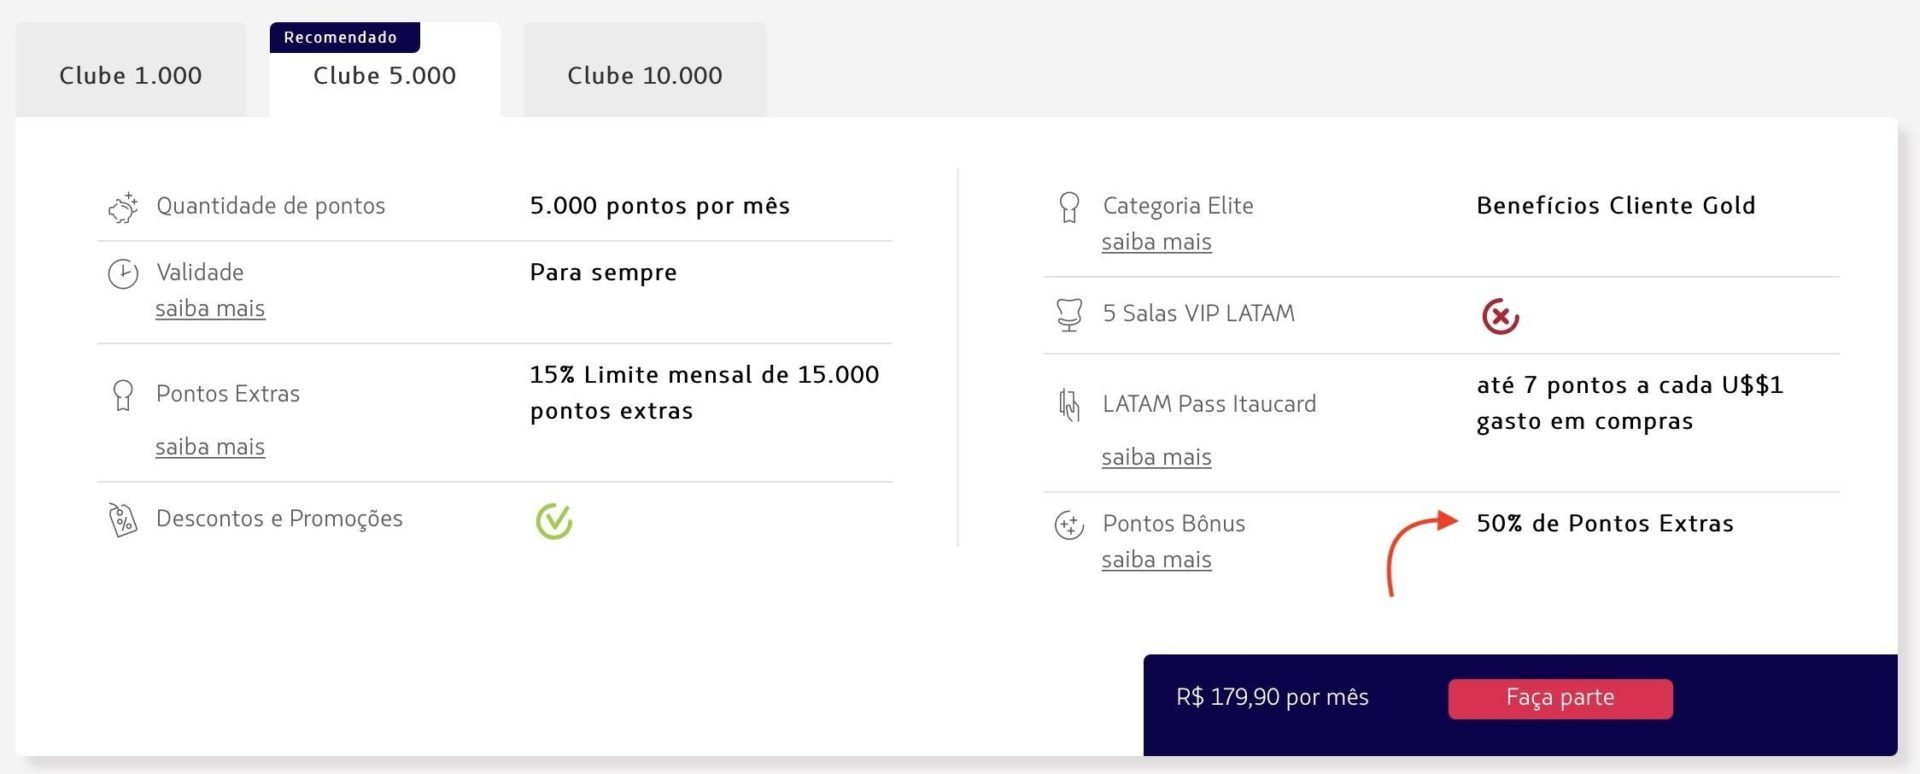 Clube LATAM Pass bônus